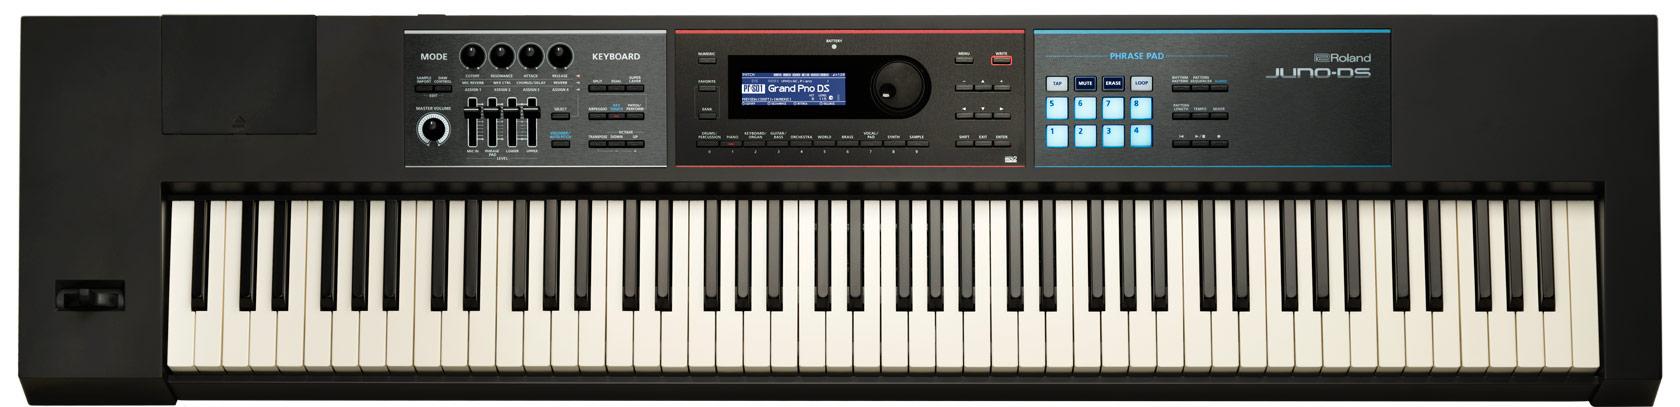 88-Key Synthesizer/Arranger